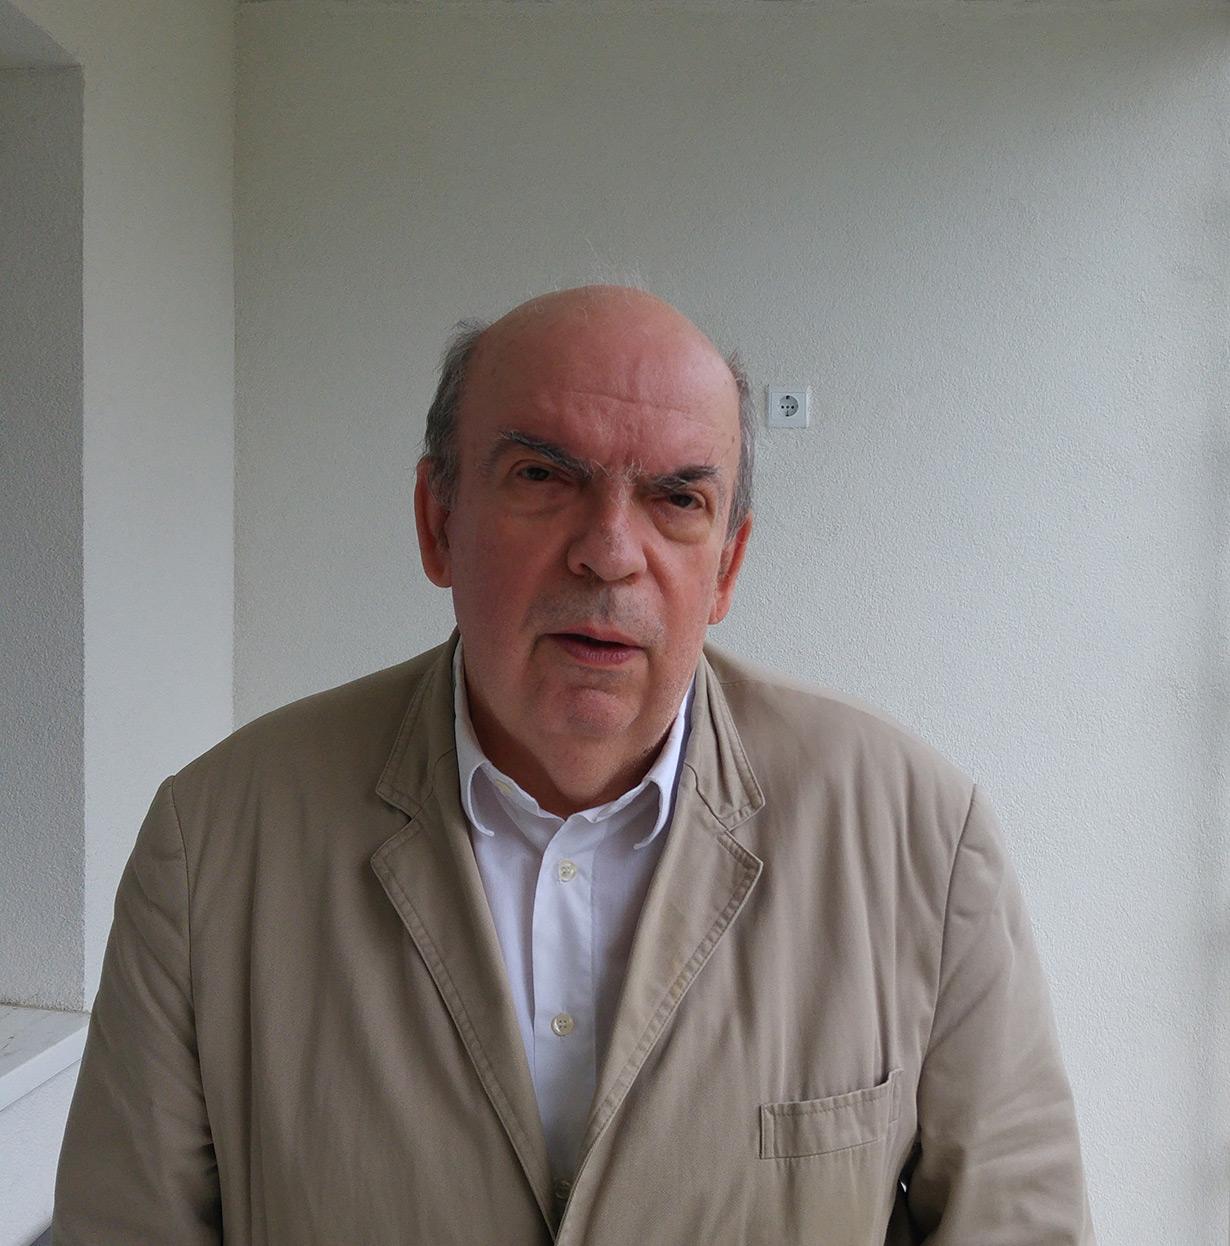 Miklós Peternák, director of C3